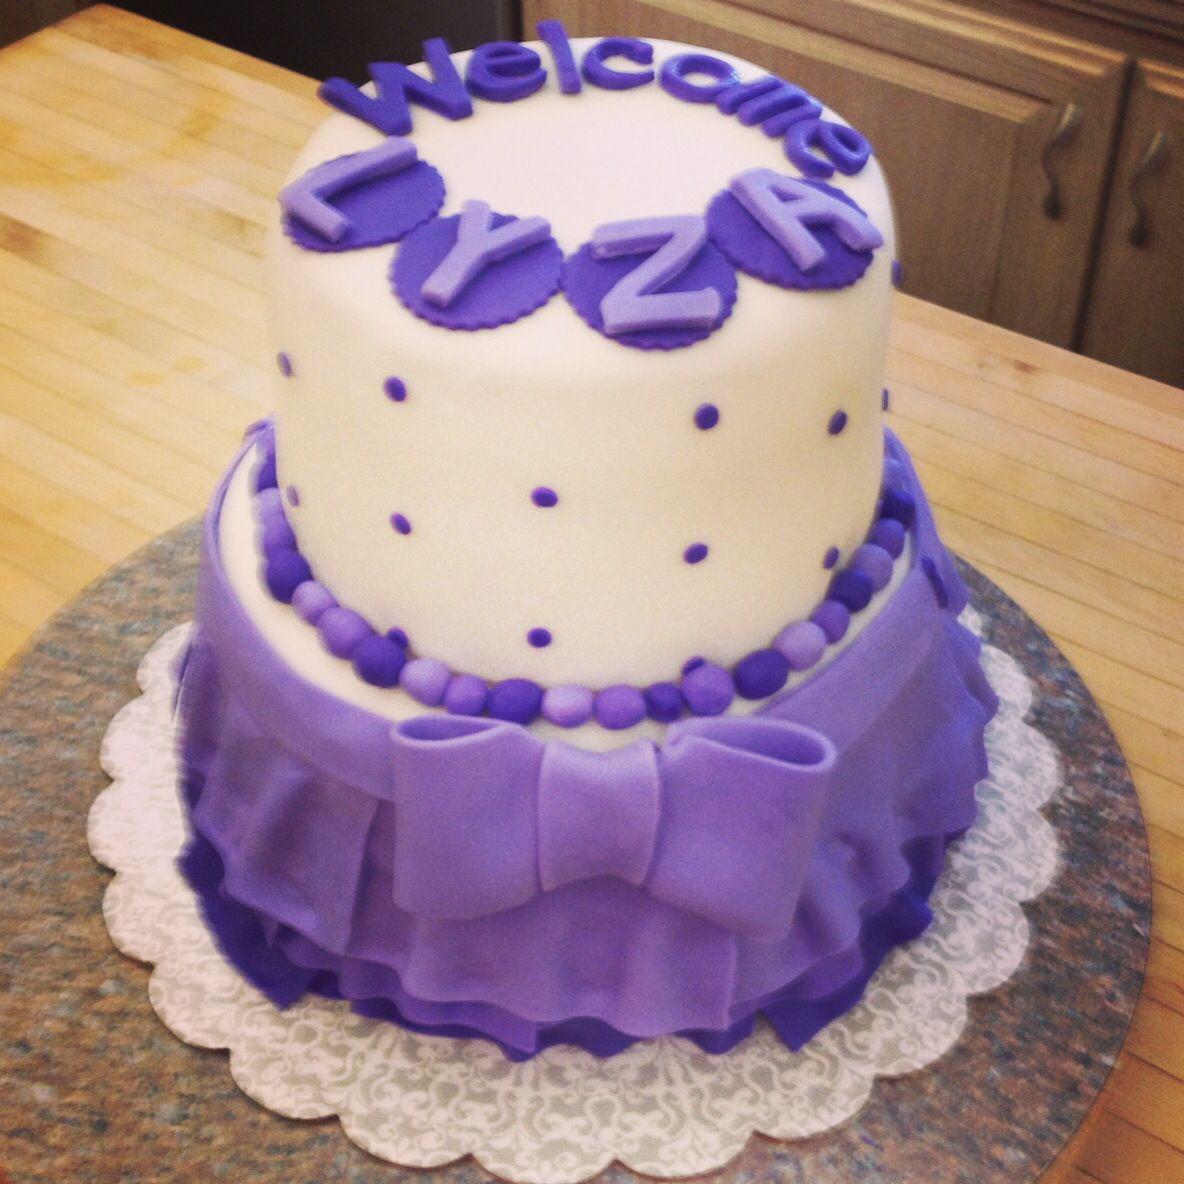 Cake Decorating Store Cincinnati : Living Room Decorating Ideas: Baby Shower Cakes Cincinnati